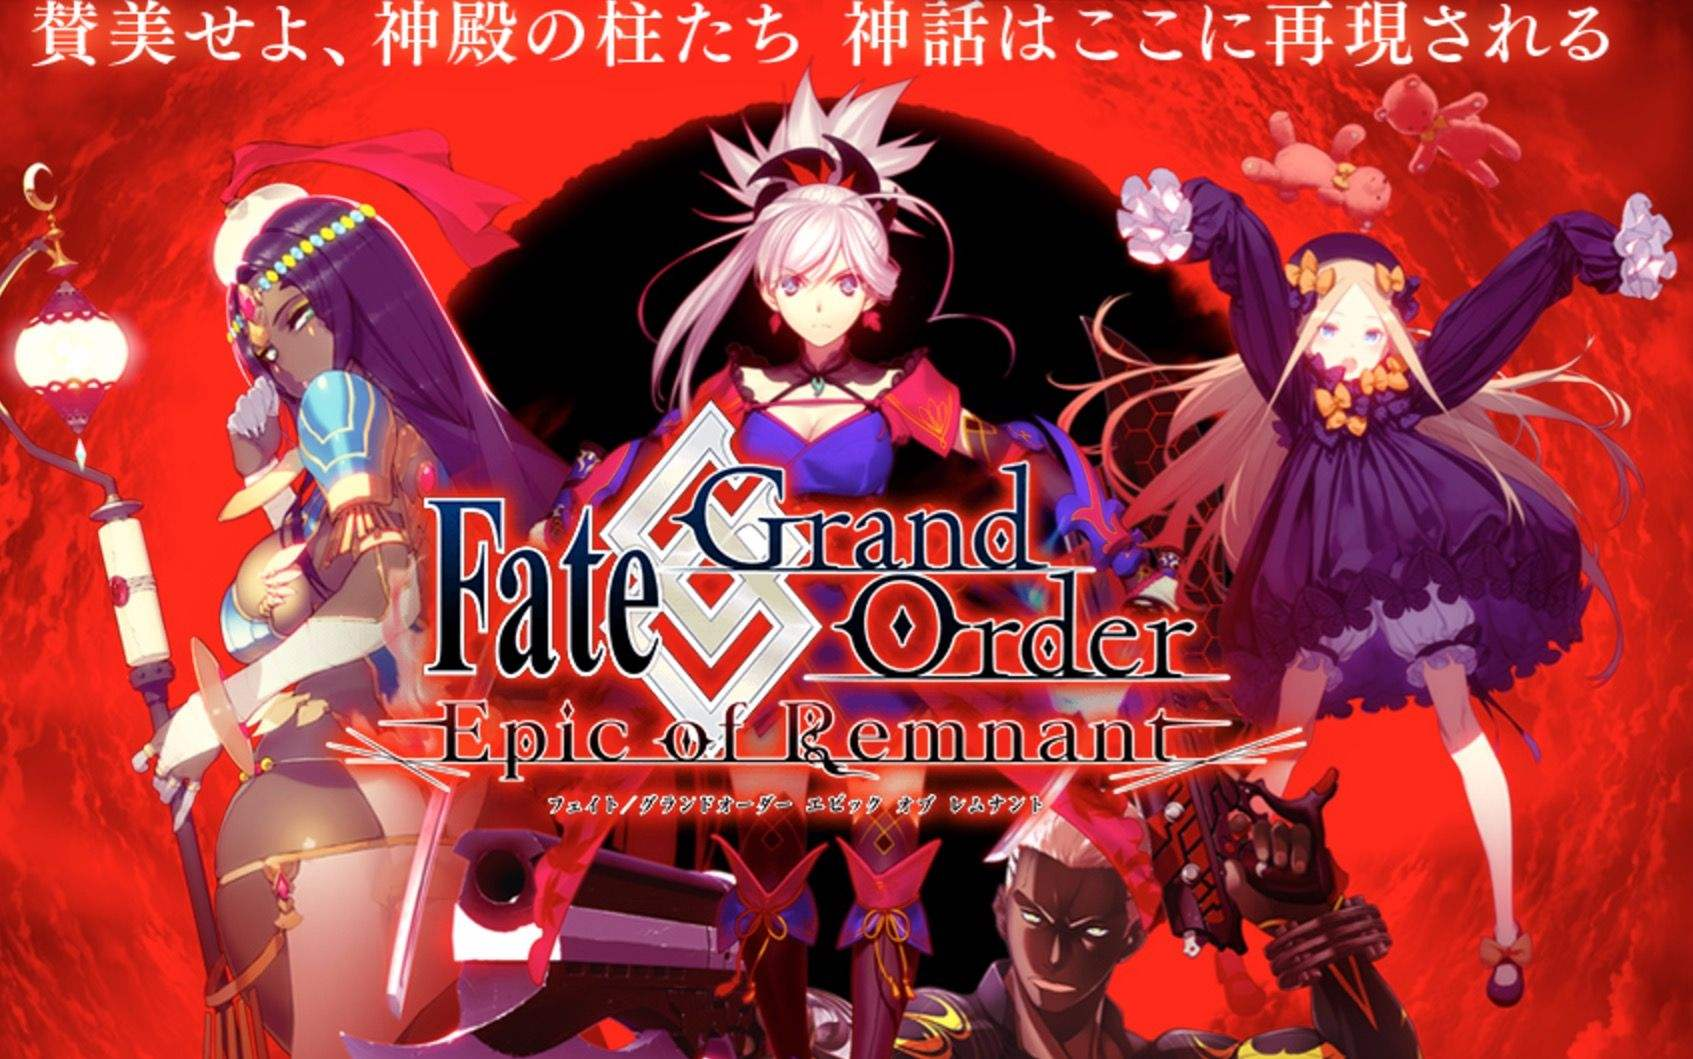 「Lose Your Way」Fate/Grand Order新宿幻灵事件主题曲 在线赏析下载